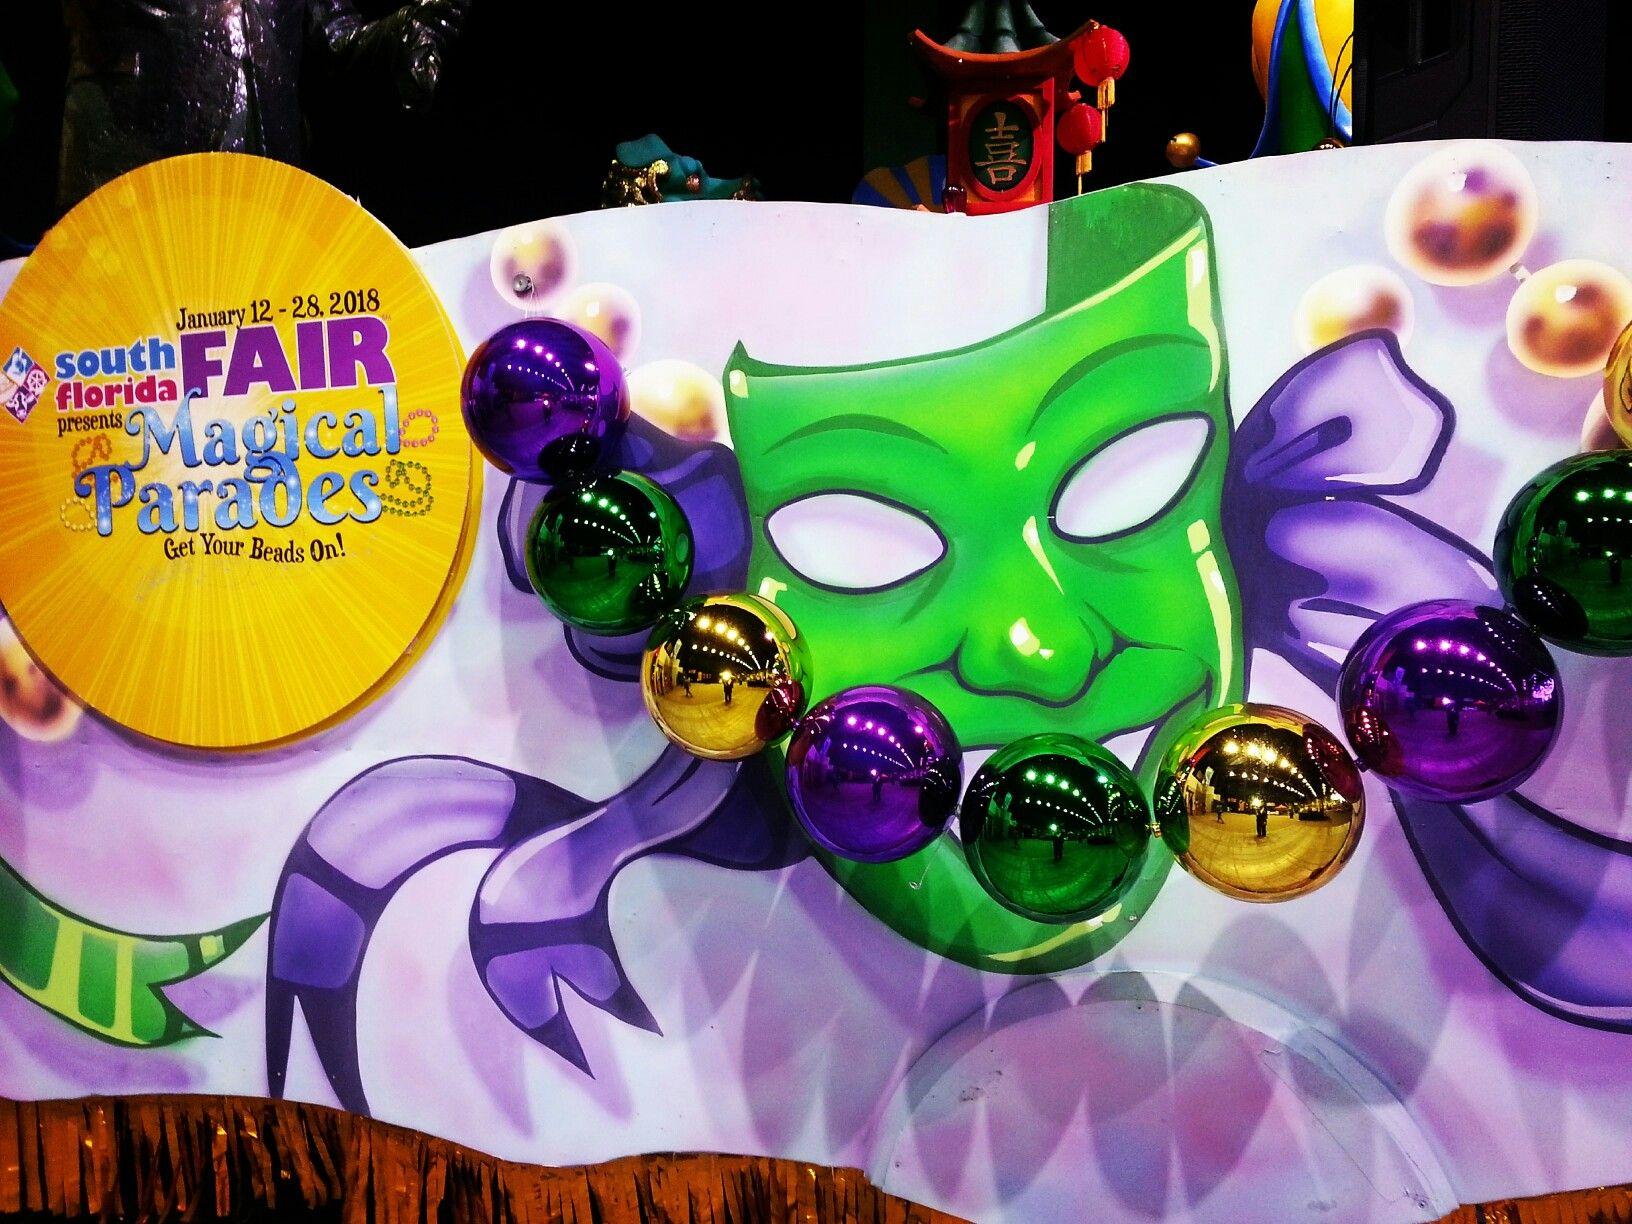 Hottest fattuesday specials 2018 south florida fair at